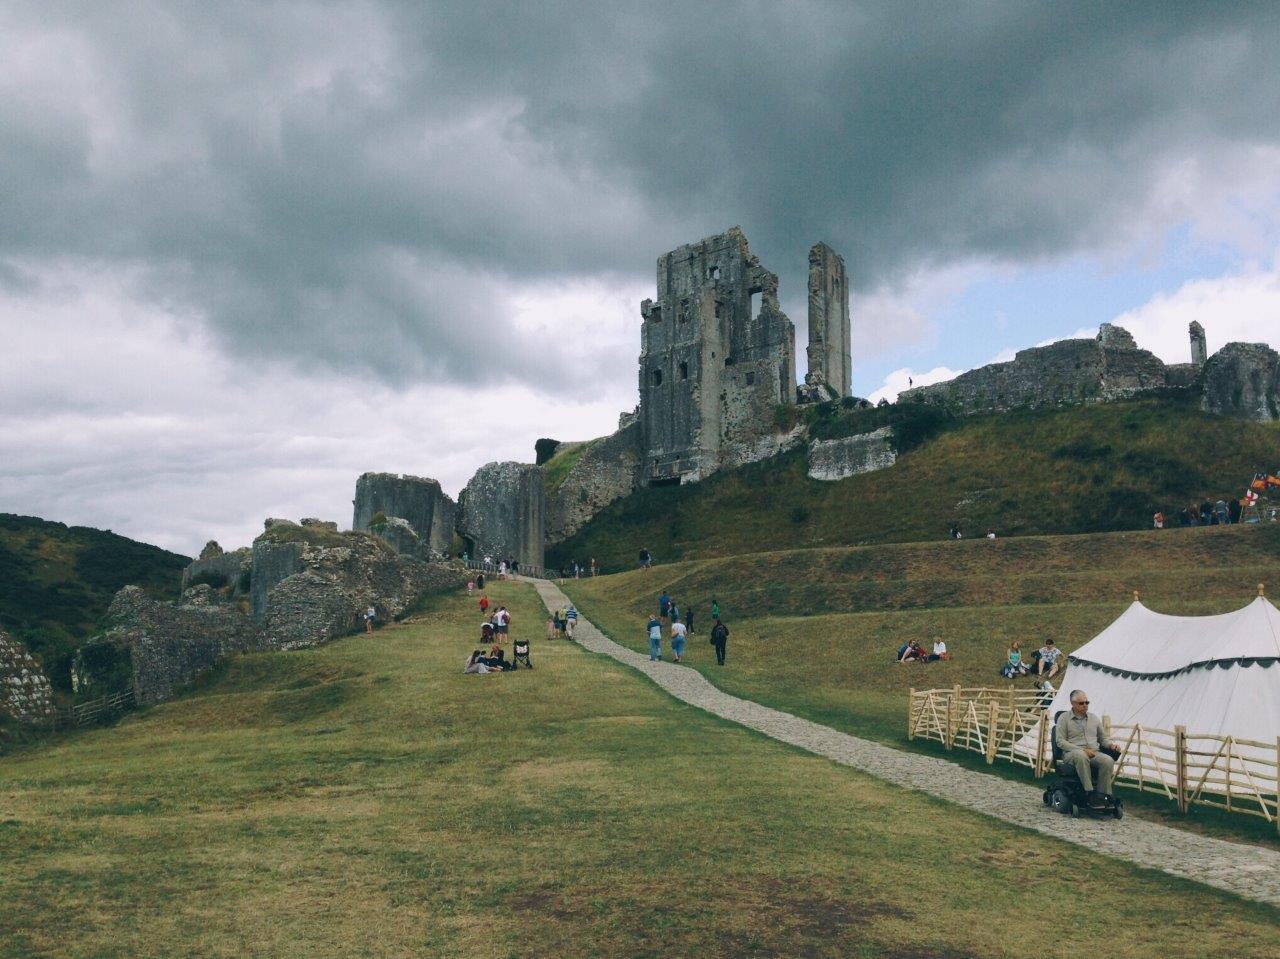 Visiting Corfe Castle